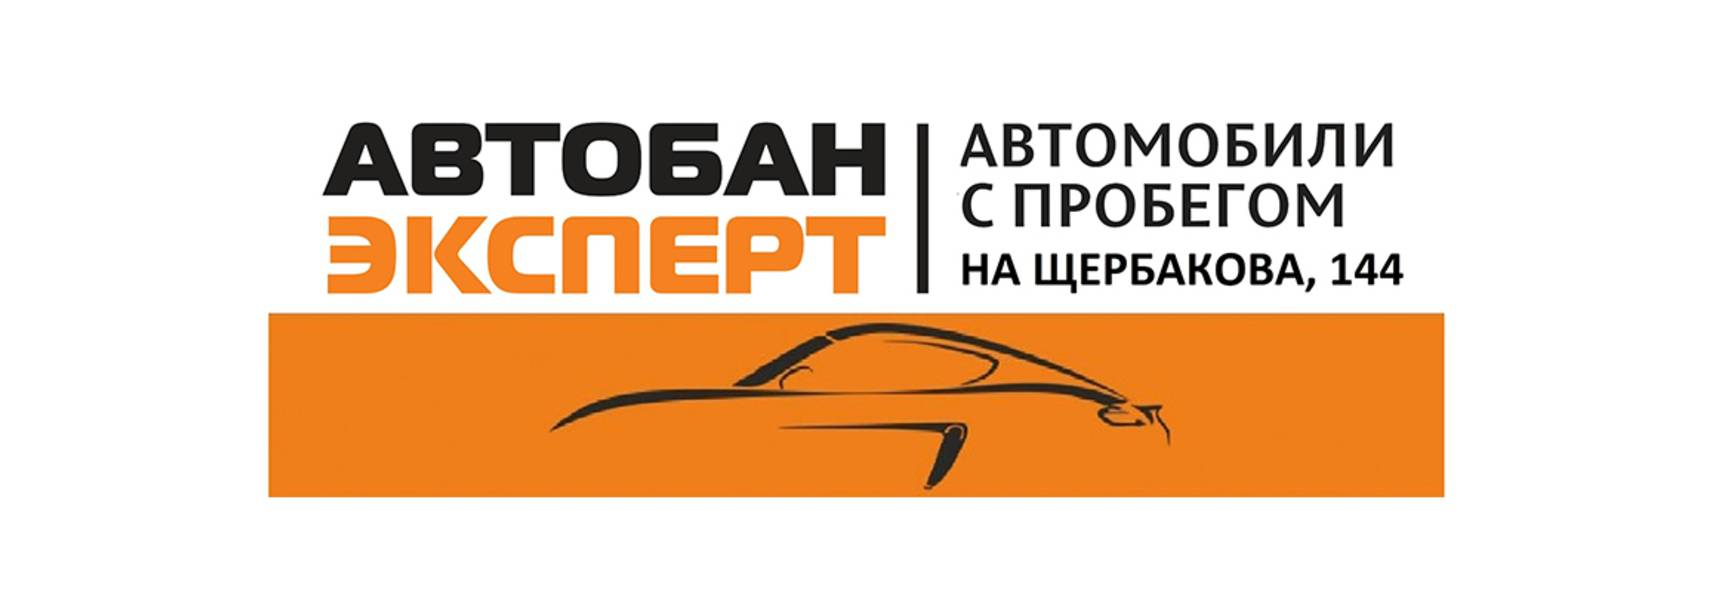 «Автобан-Эксперт» на Щербакова, 144